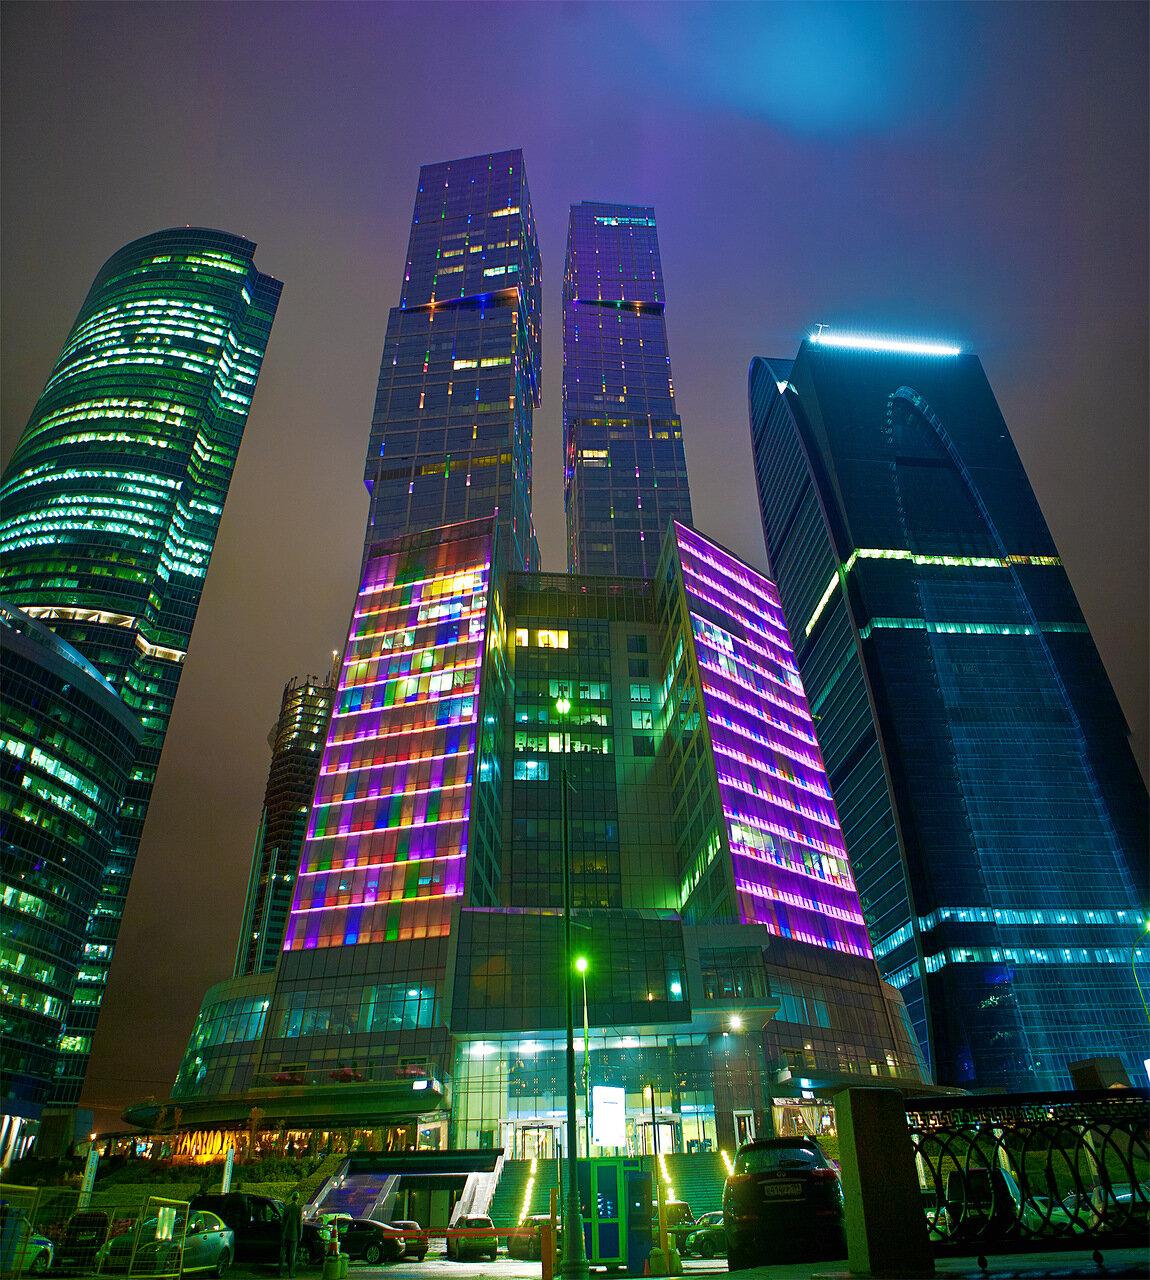 http://img-fotki.yandex.ru/get/6311/88584334.47/0_848f9_25419ec7_XXXL.jpg